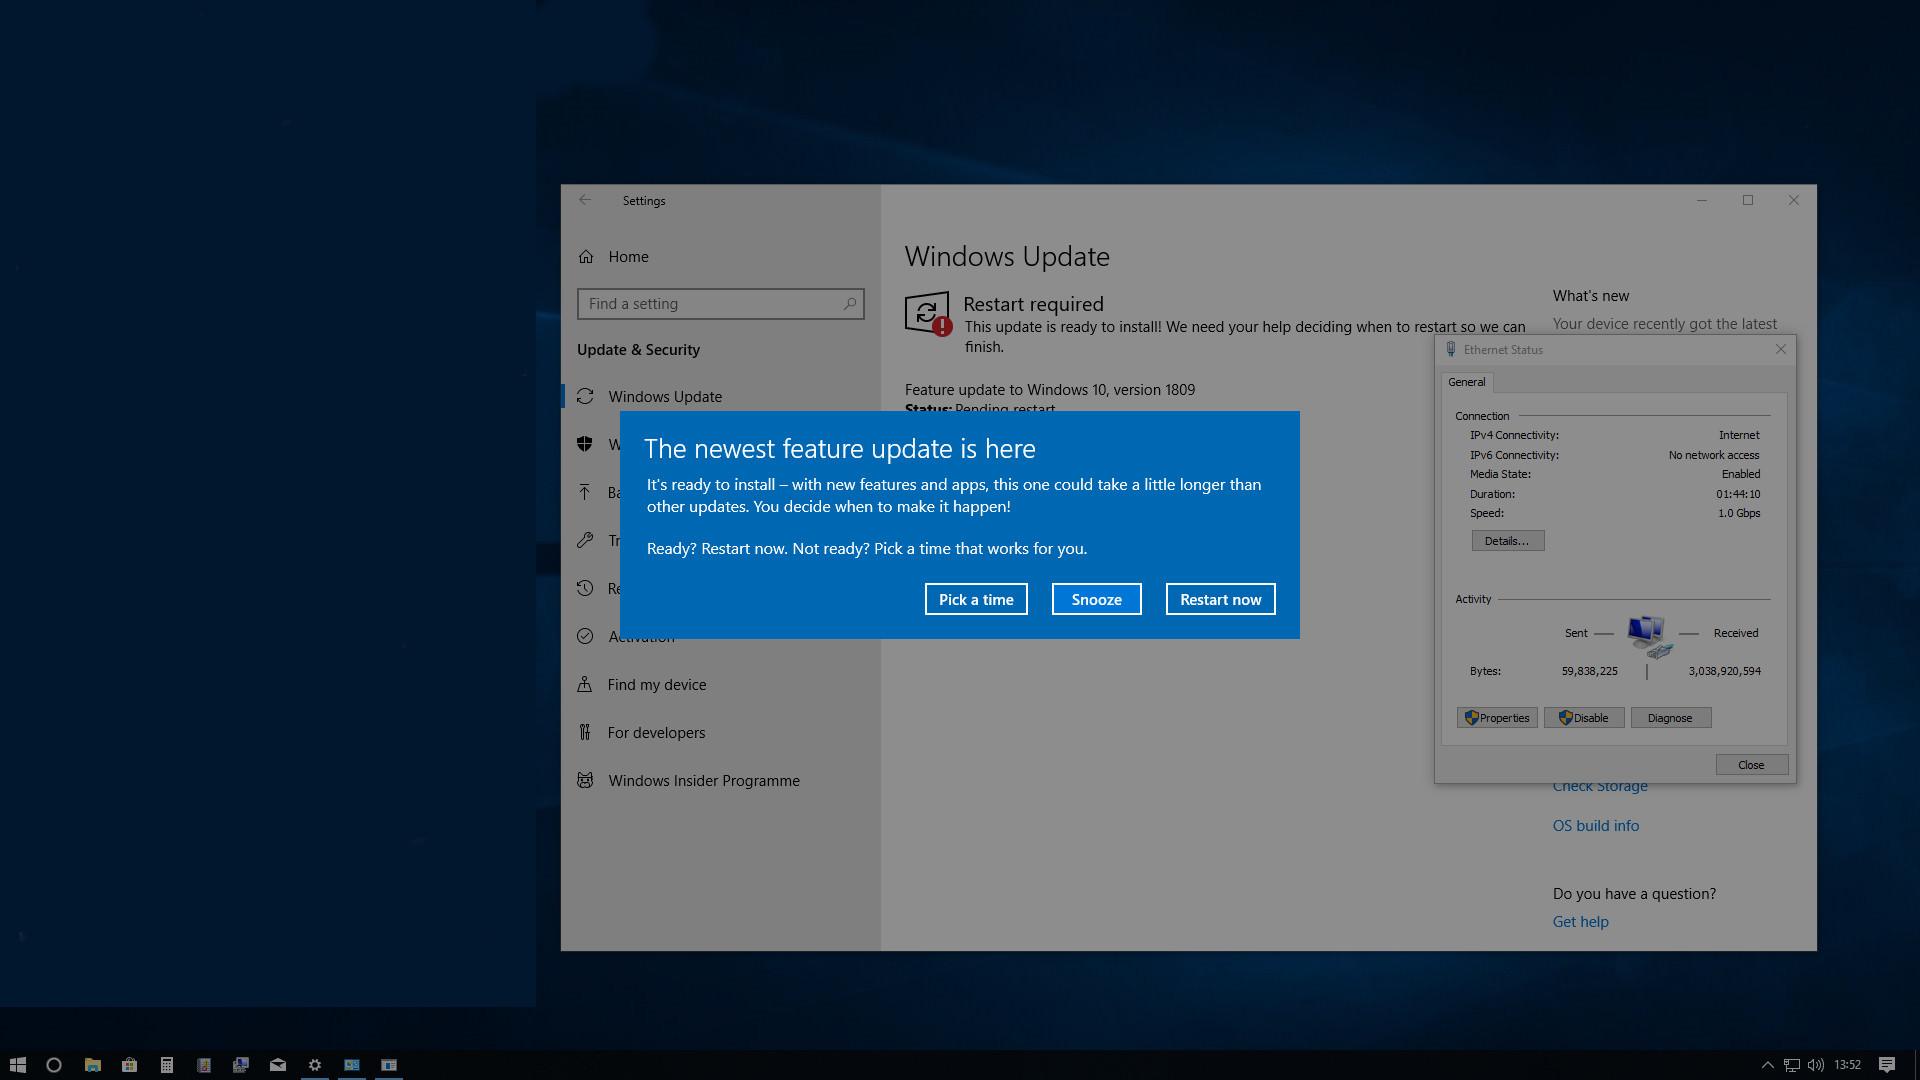 I downloaded Windows 10 vers 1803 - Page 3 - Virgin Media Community